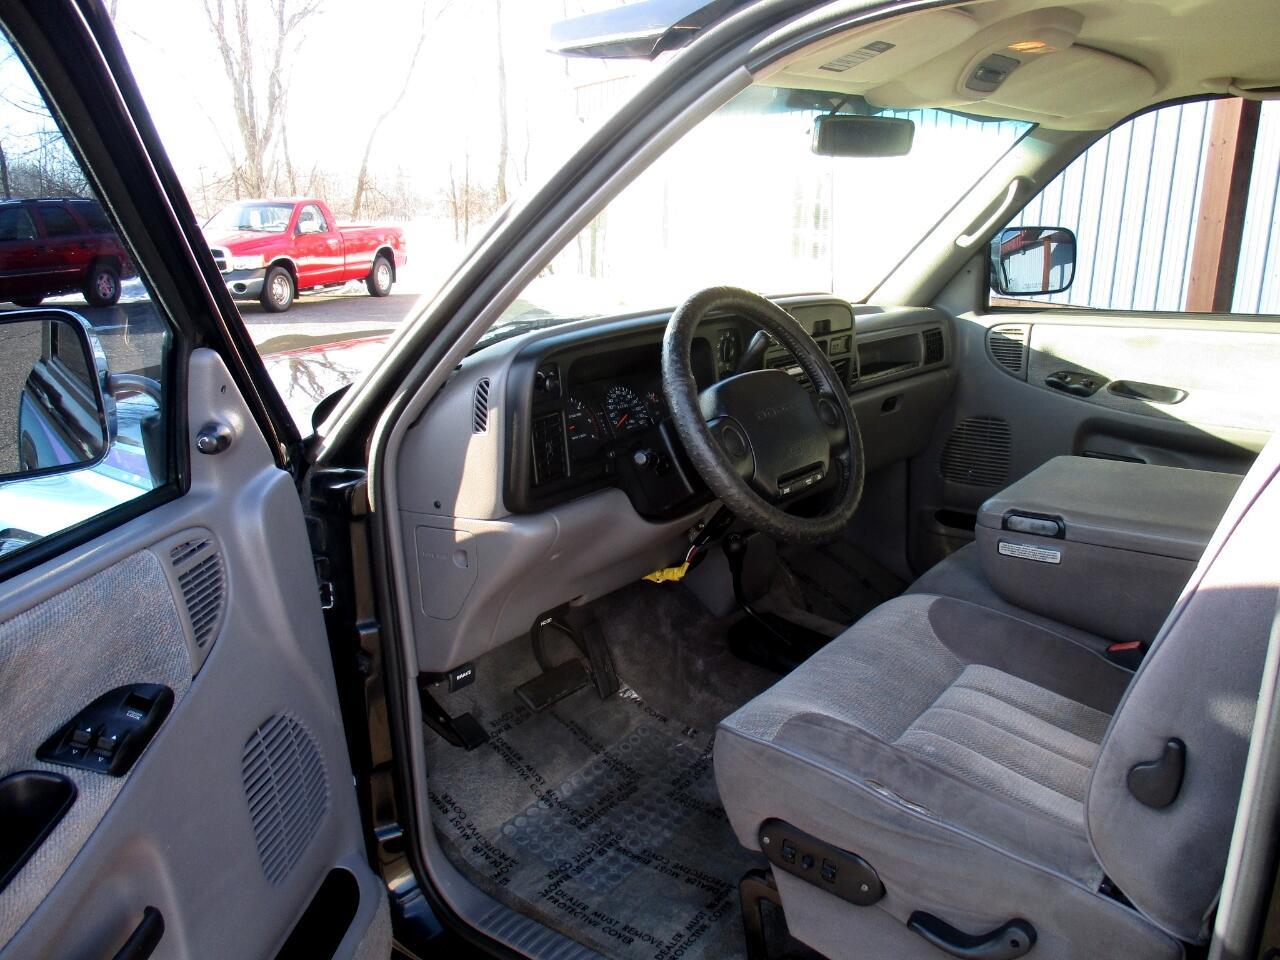 1996 Dodge Ram 2500 Reg Cab 135